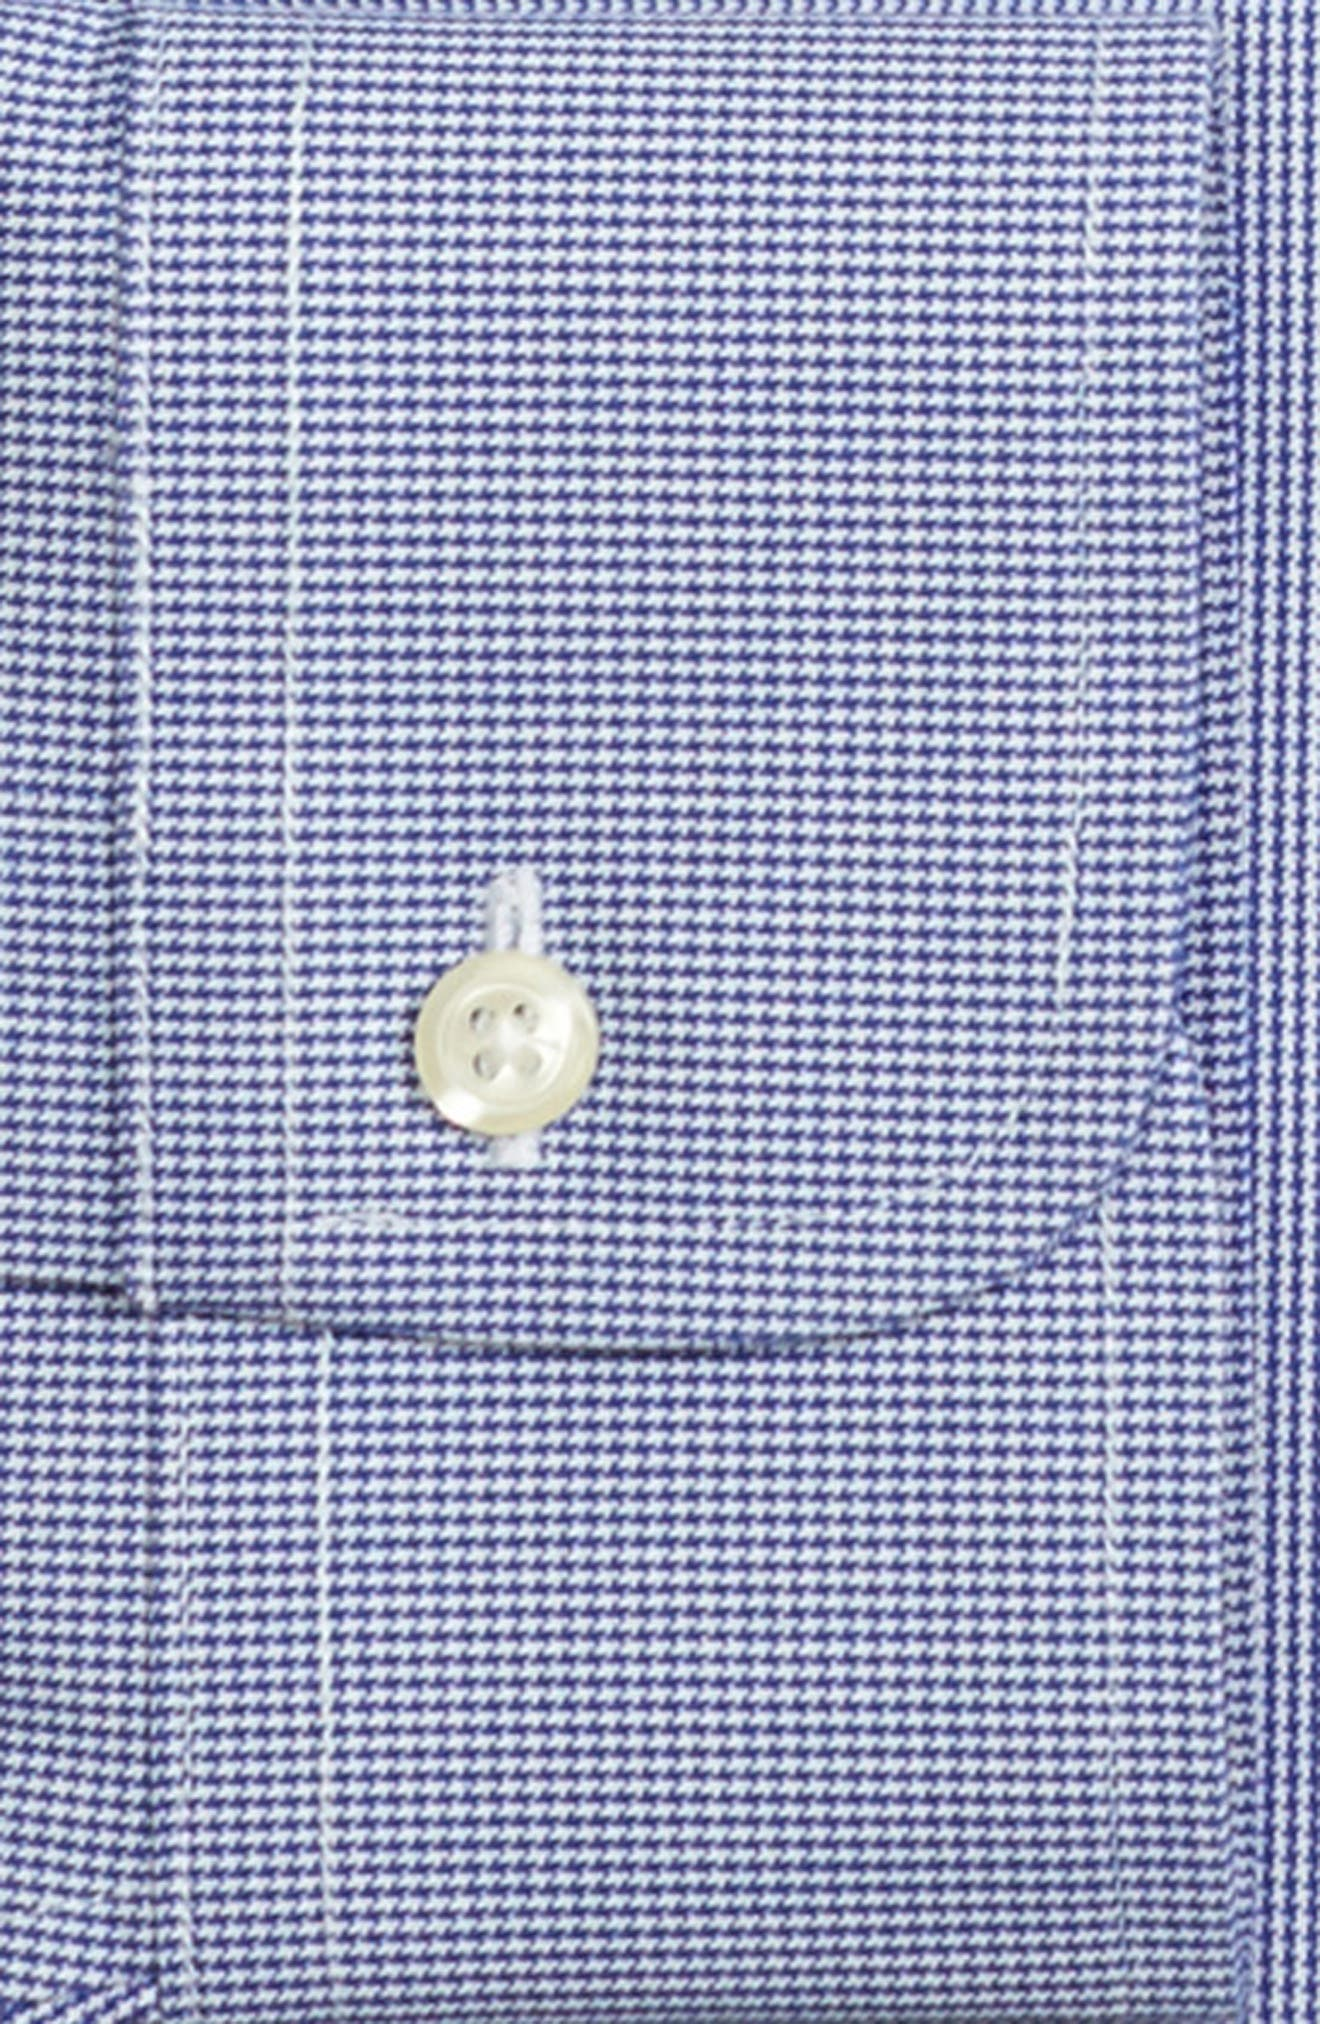 Regular Fit Houndstooth Dress Shirt,                             Alternate thumbnail 2, color,                             BLUE